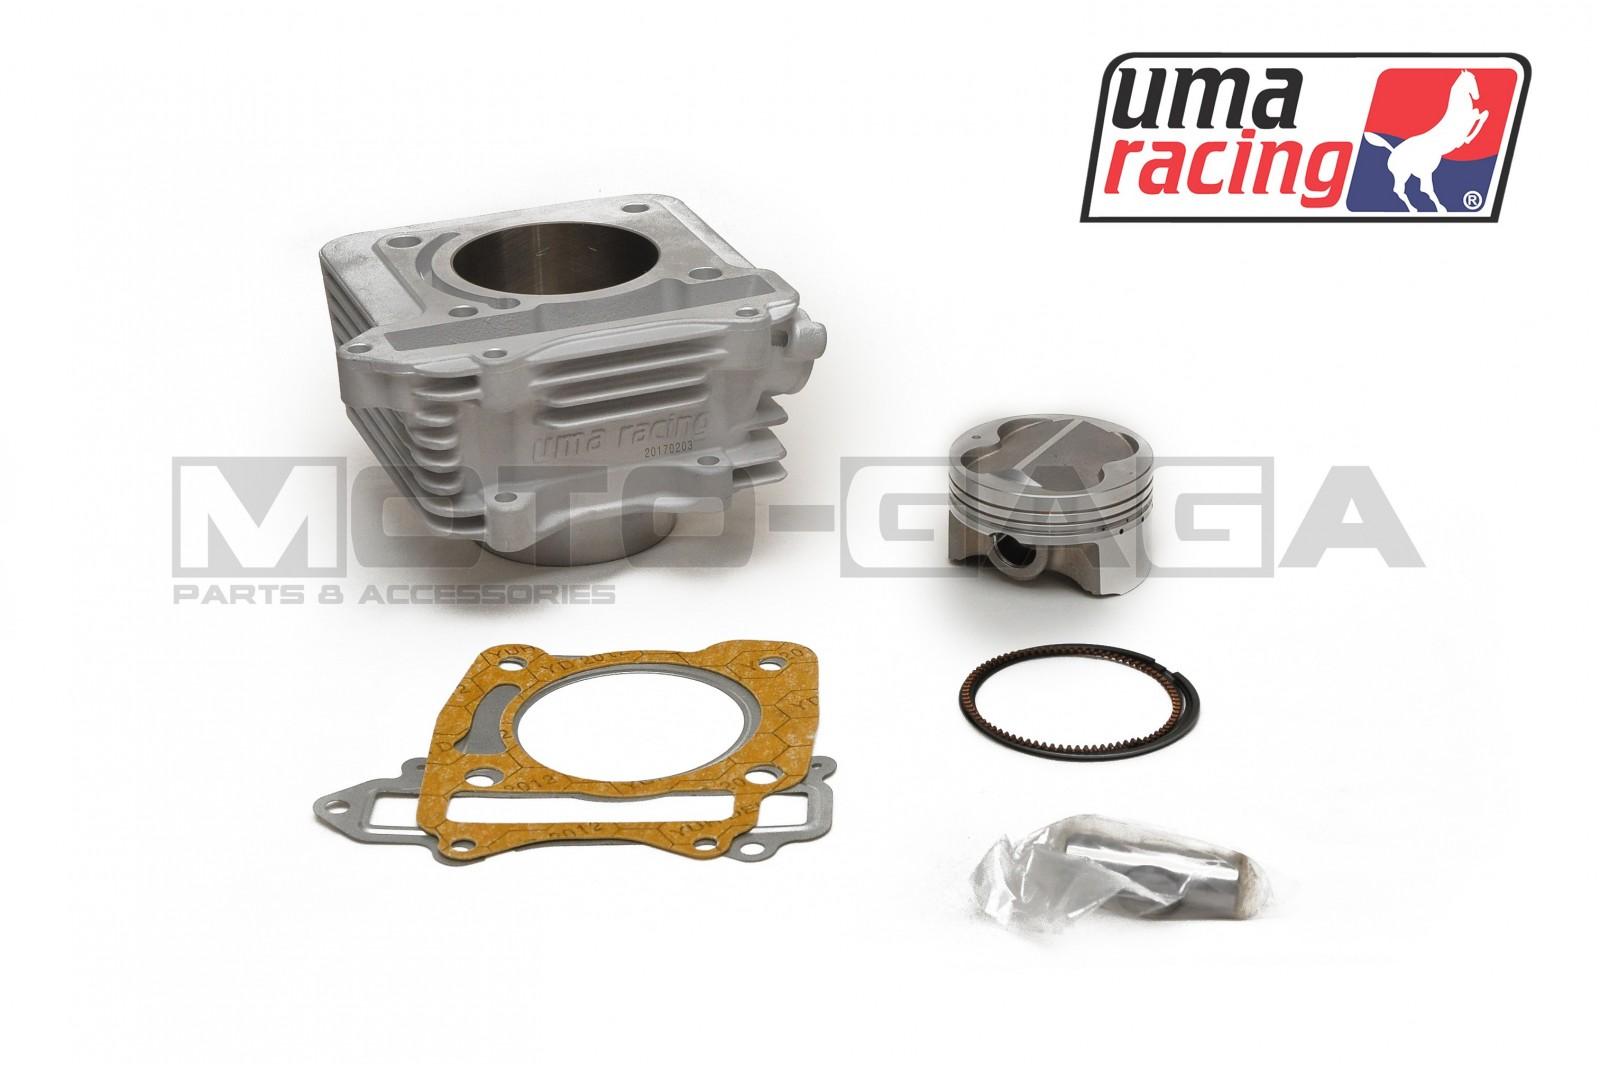 UMA Racing 68mm (177cc) Big Bore Cylinder Kit - Suzuki Raider  150r/Belang/Satria FU150/FX125/FXR150 Options Standard Piston